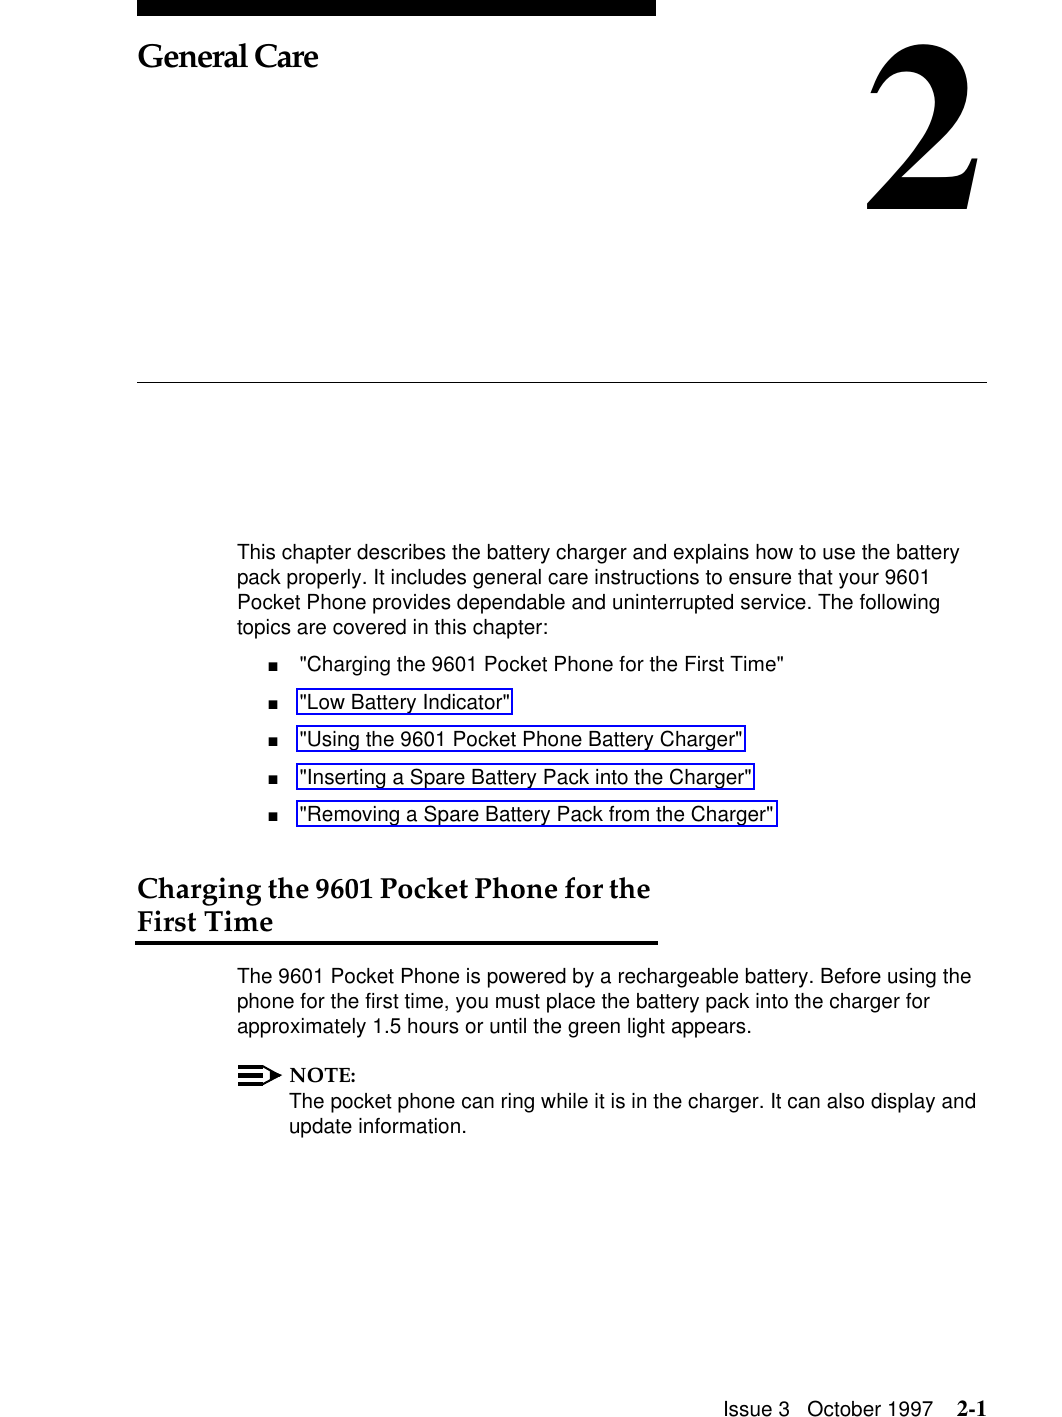 Motorola 9601 Users Manual